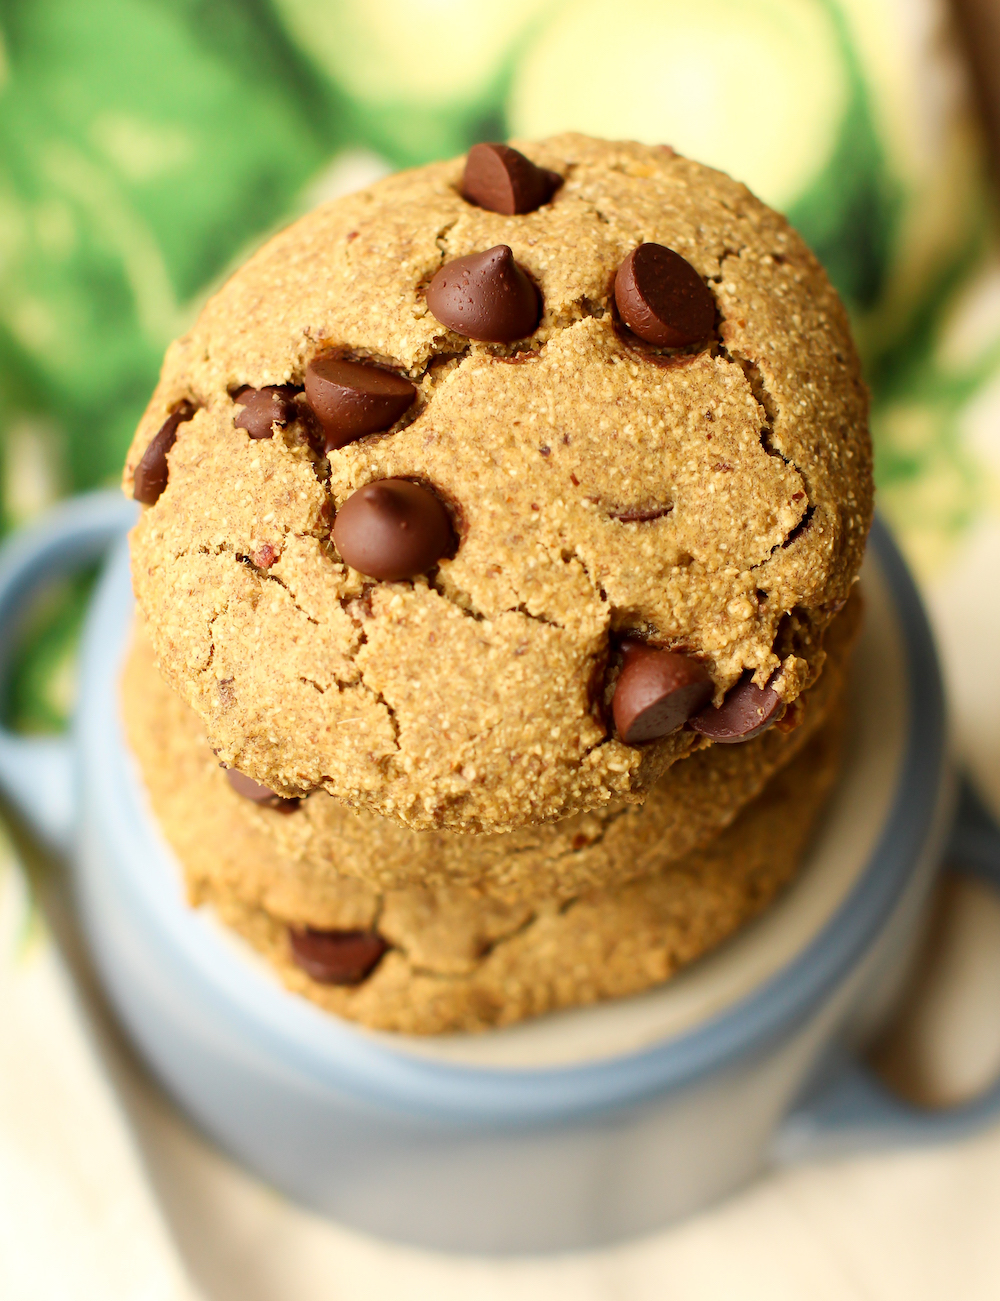 Oat Flour Chocolate Chip Cookies Vegan Gluten Free Oil